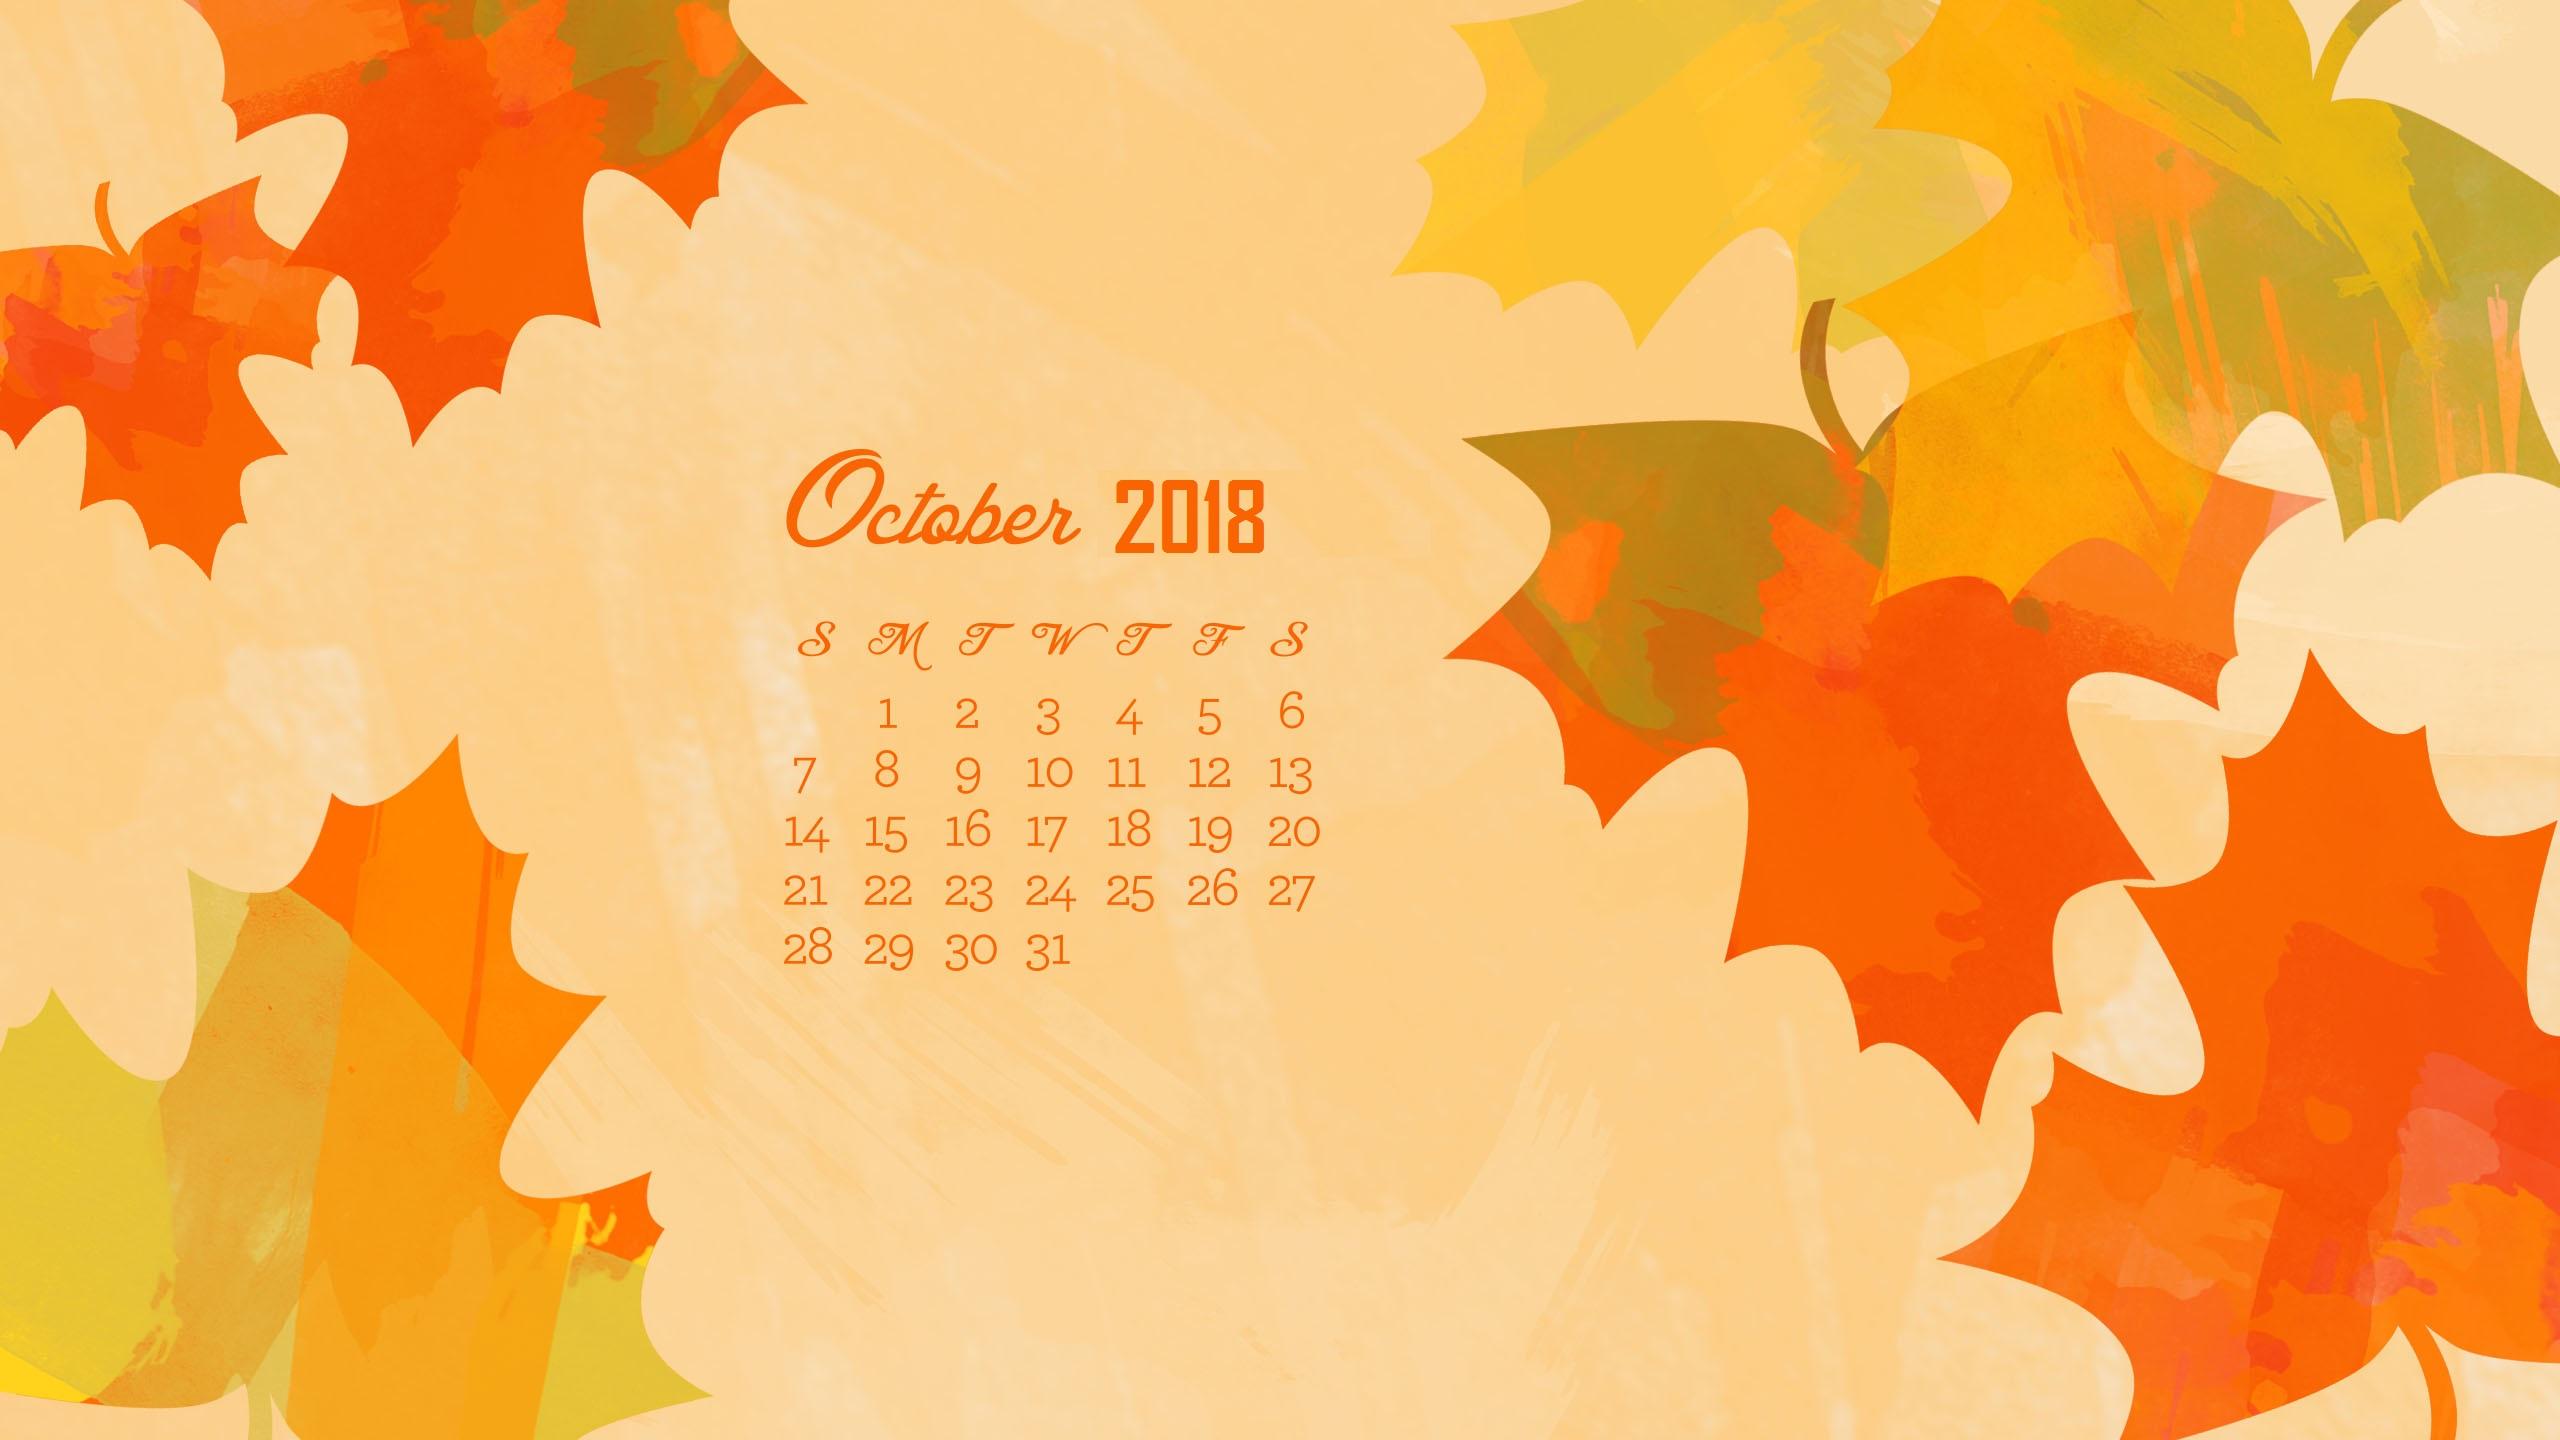 October 2018 Desktop Calendar Wallpaper